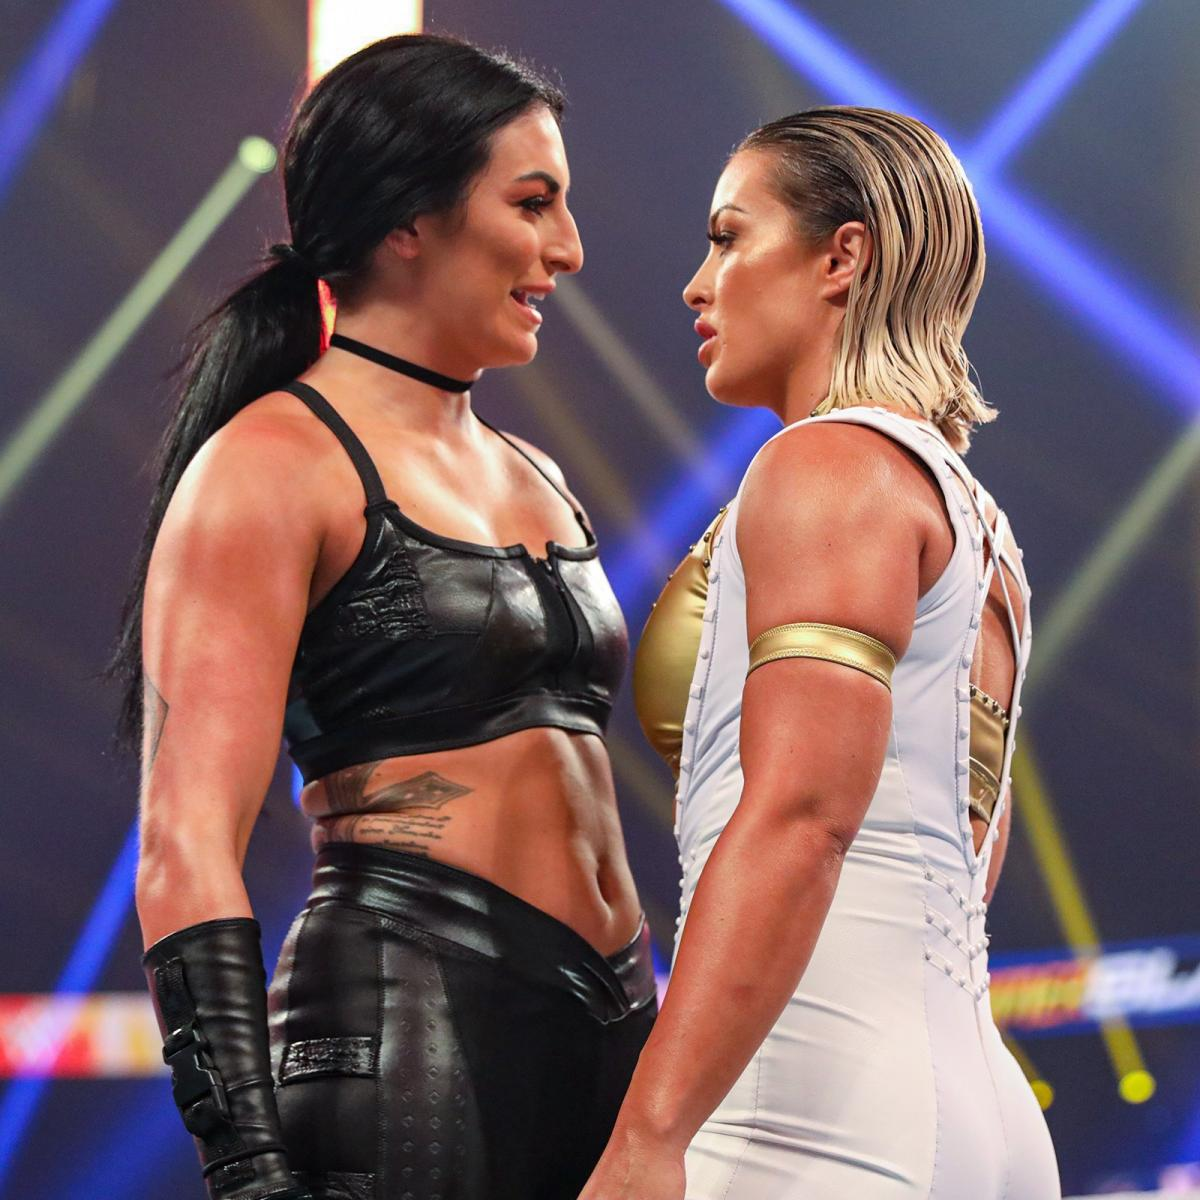 Is Sonya Deville Legit Fired By WWE After Summerslam 2020 Loss? 2